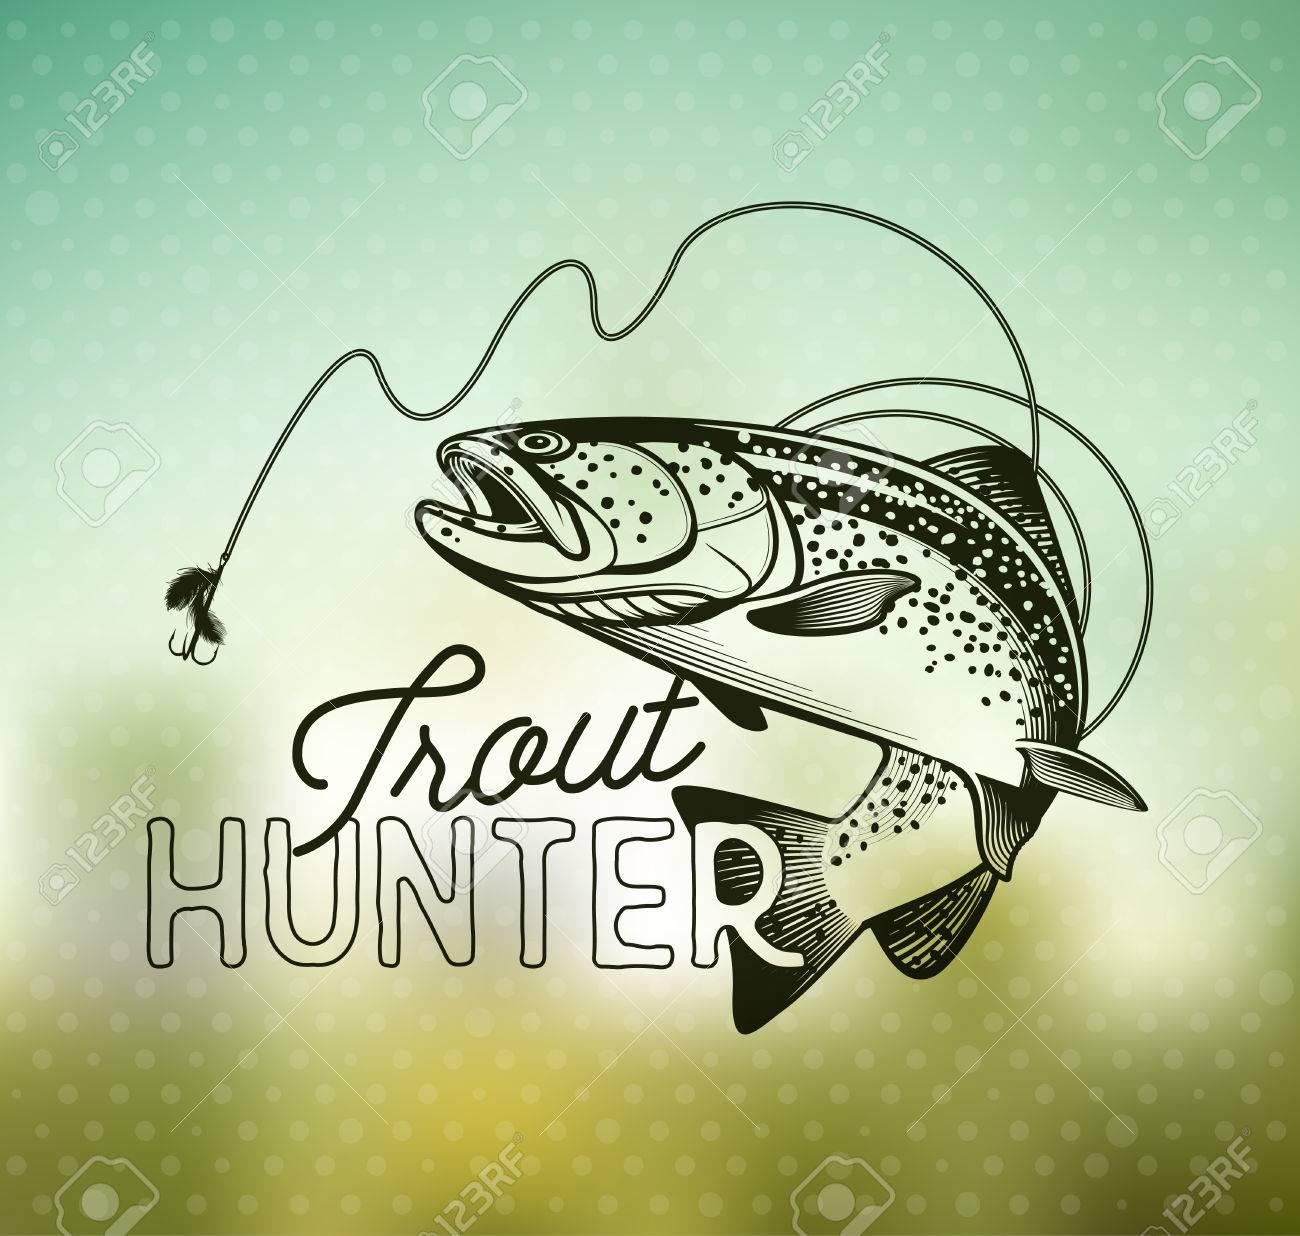 Trout Fishing emblem on blur background. Vector illustration. - 51914637